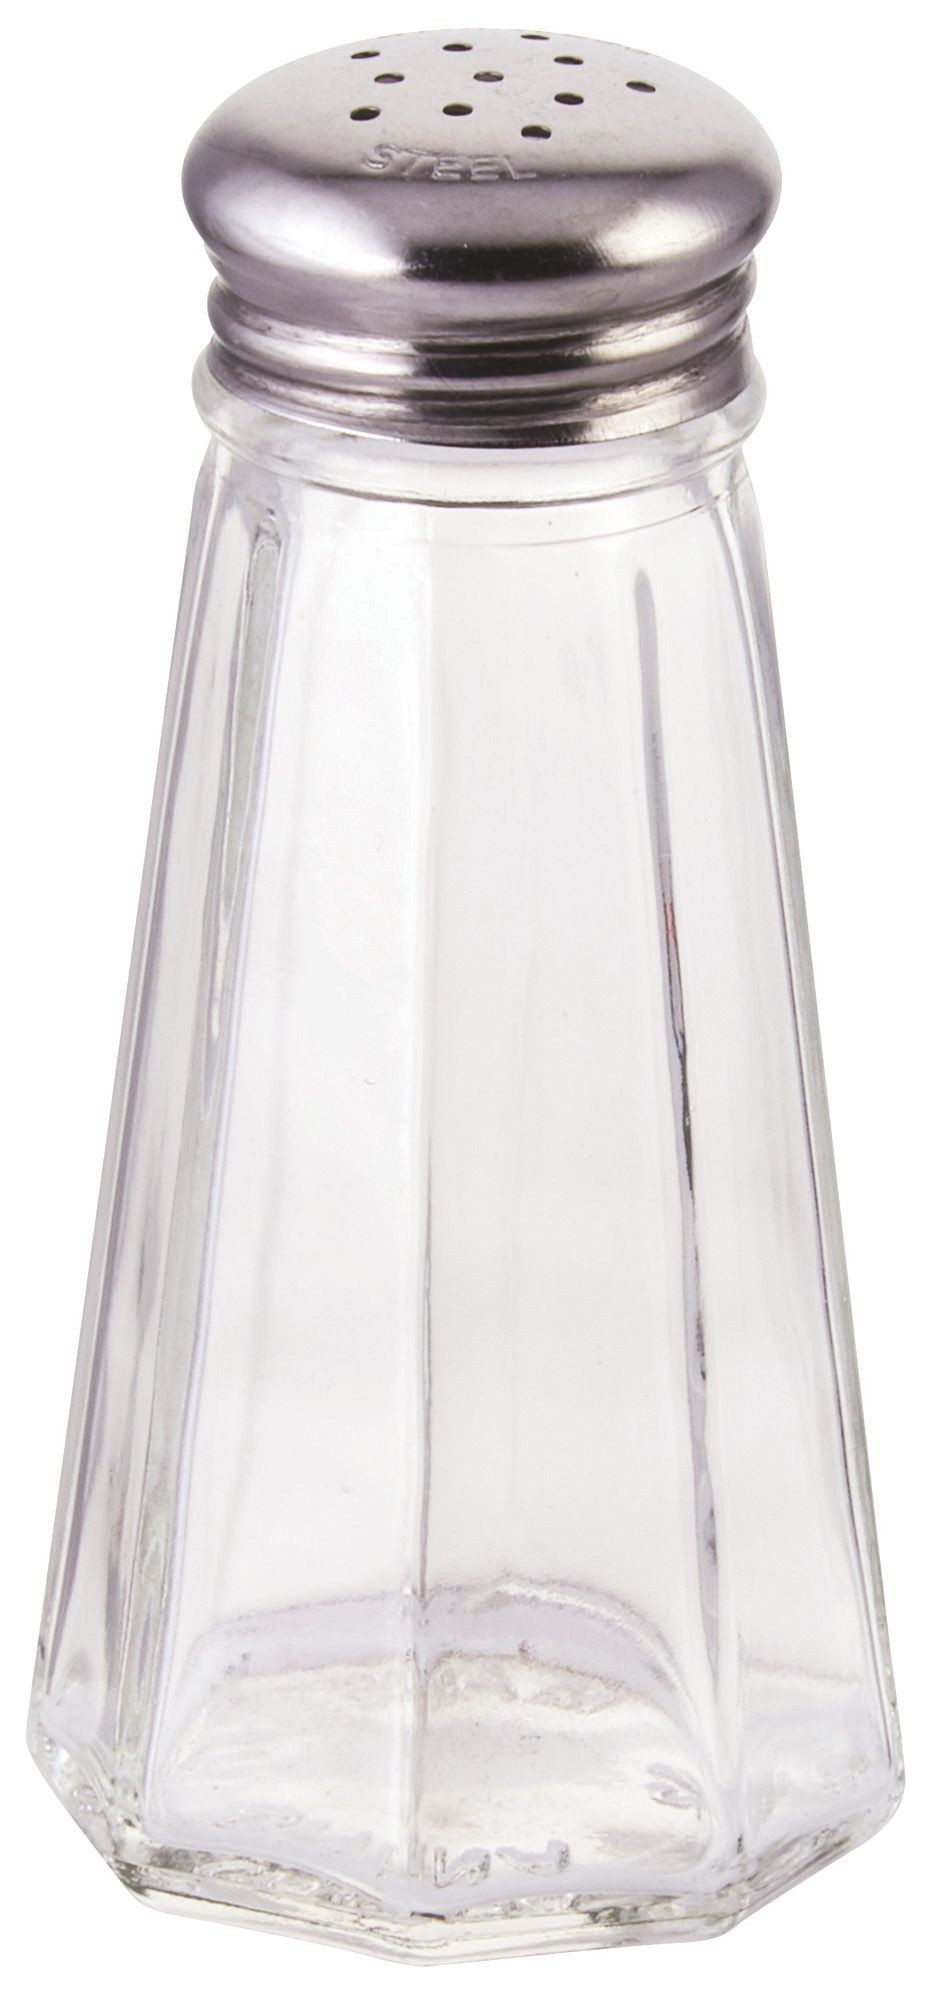 Winco G-317 Paneled Shaker 3 oz. with Mushroom Top